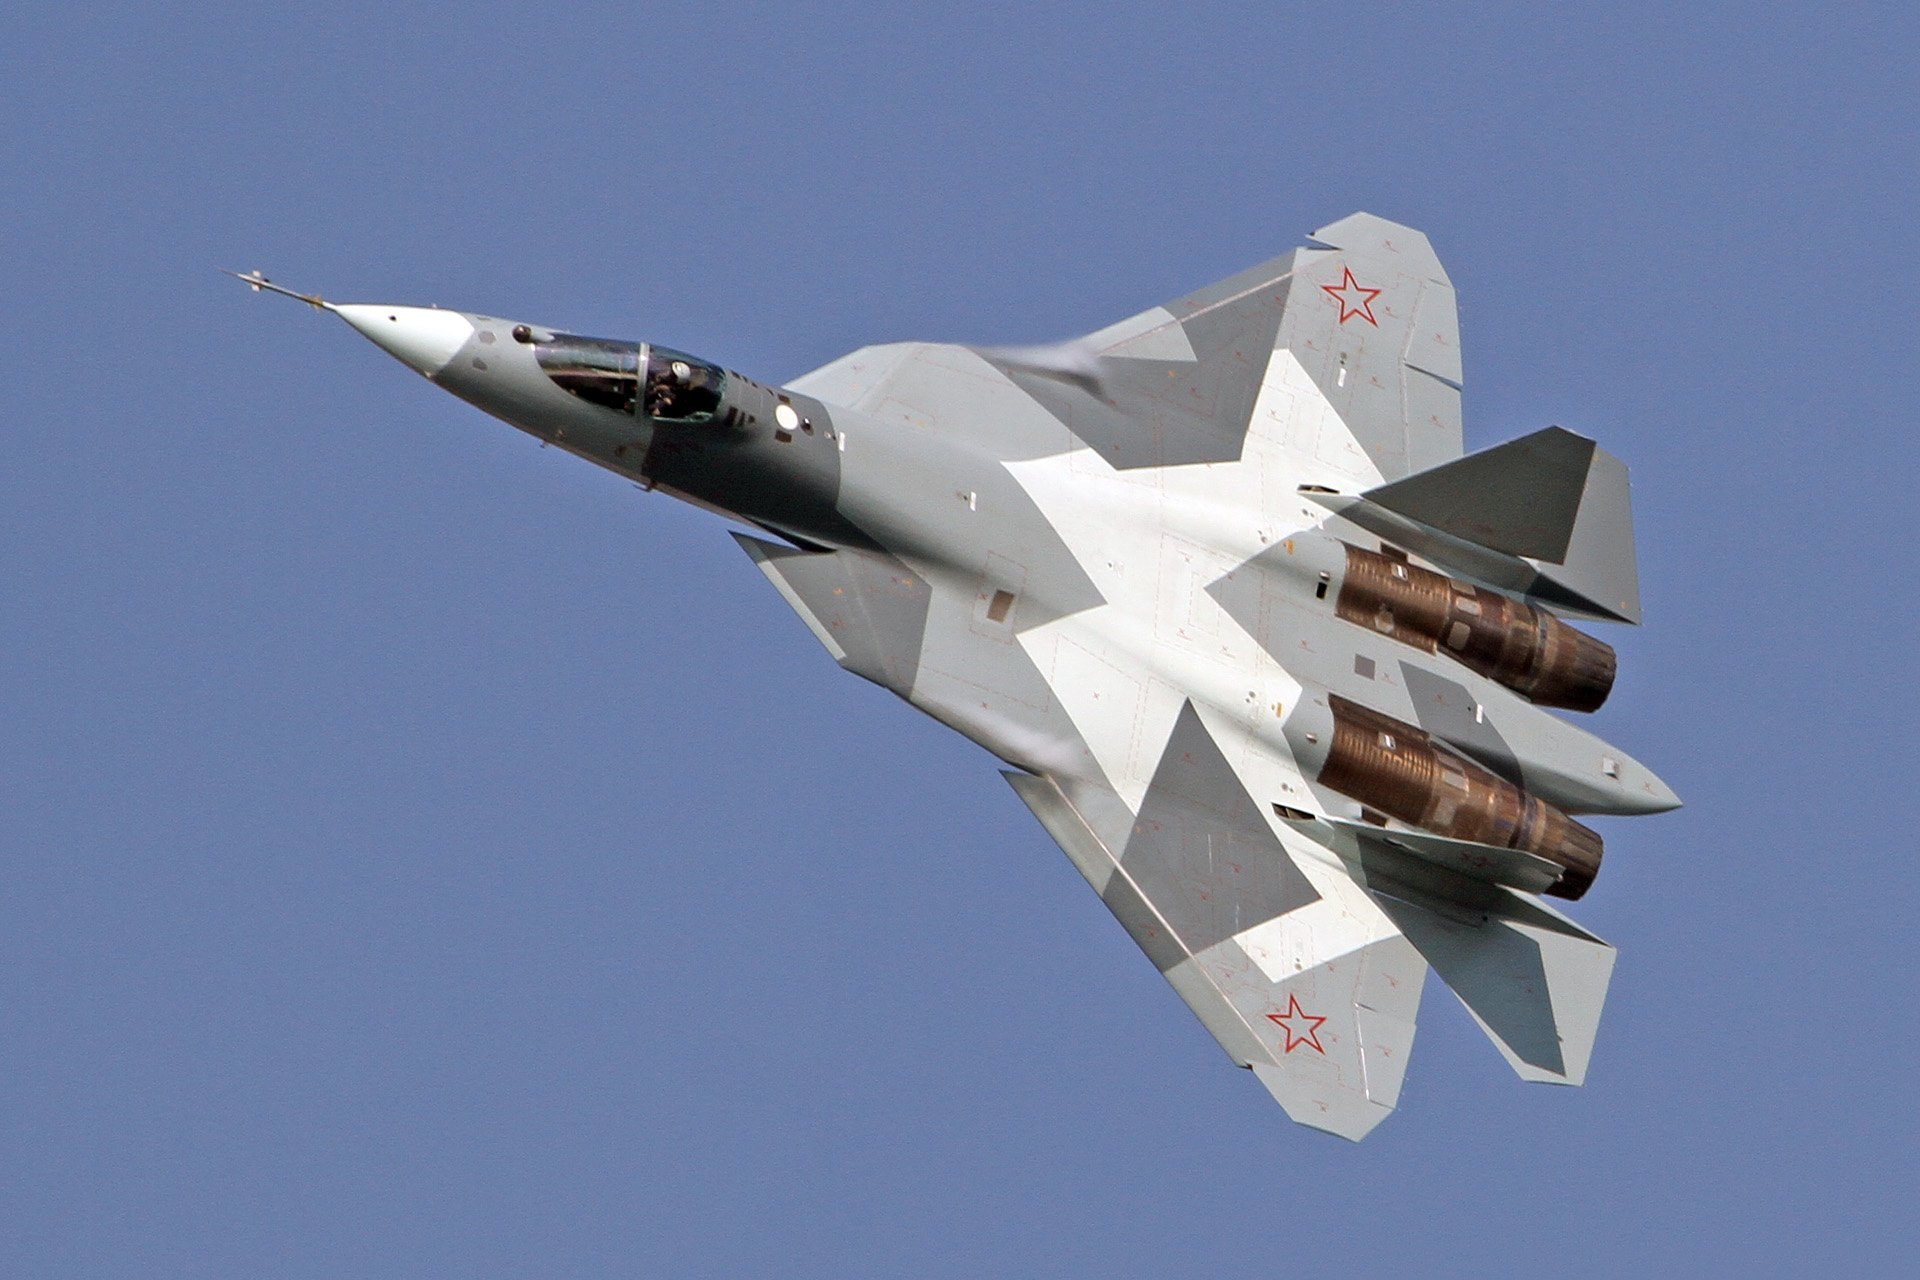 СУ-57 - самолет проекта ПАК ФА